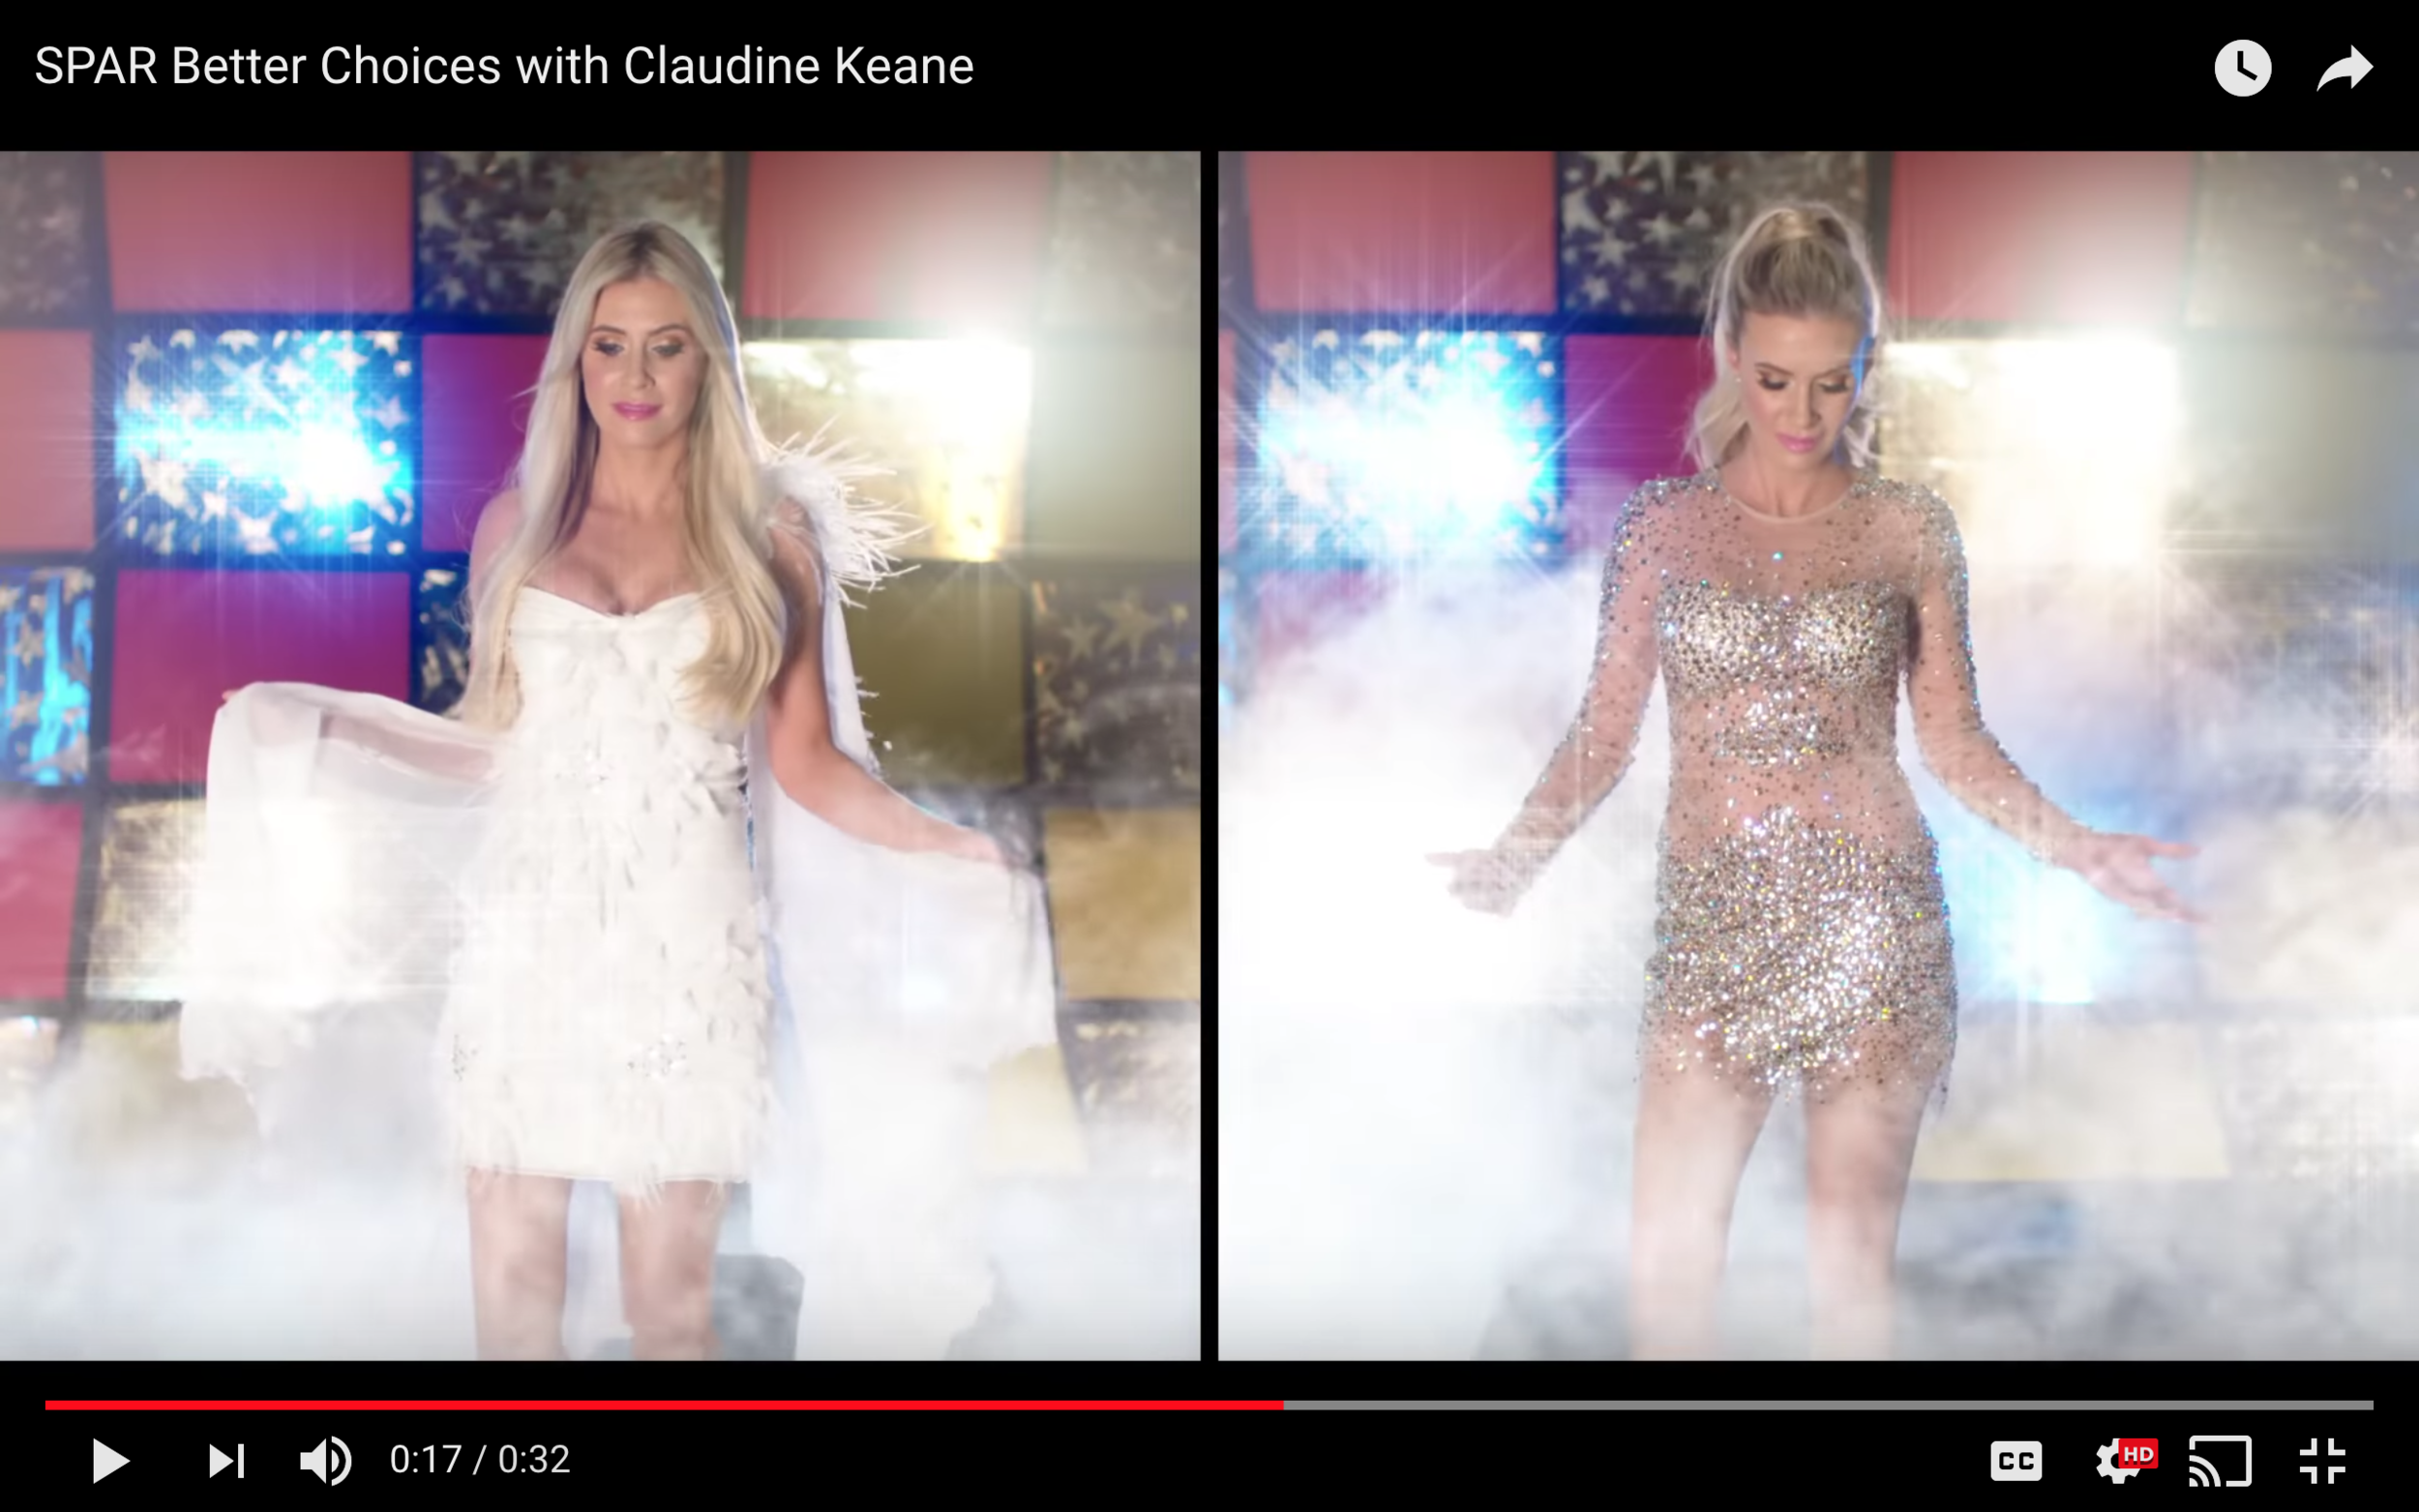 ClaudineKeane_Sparad